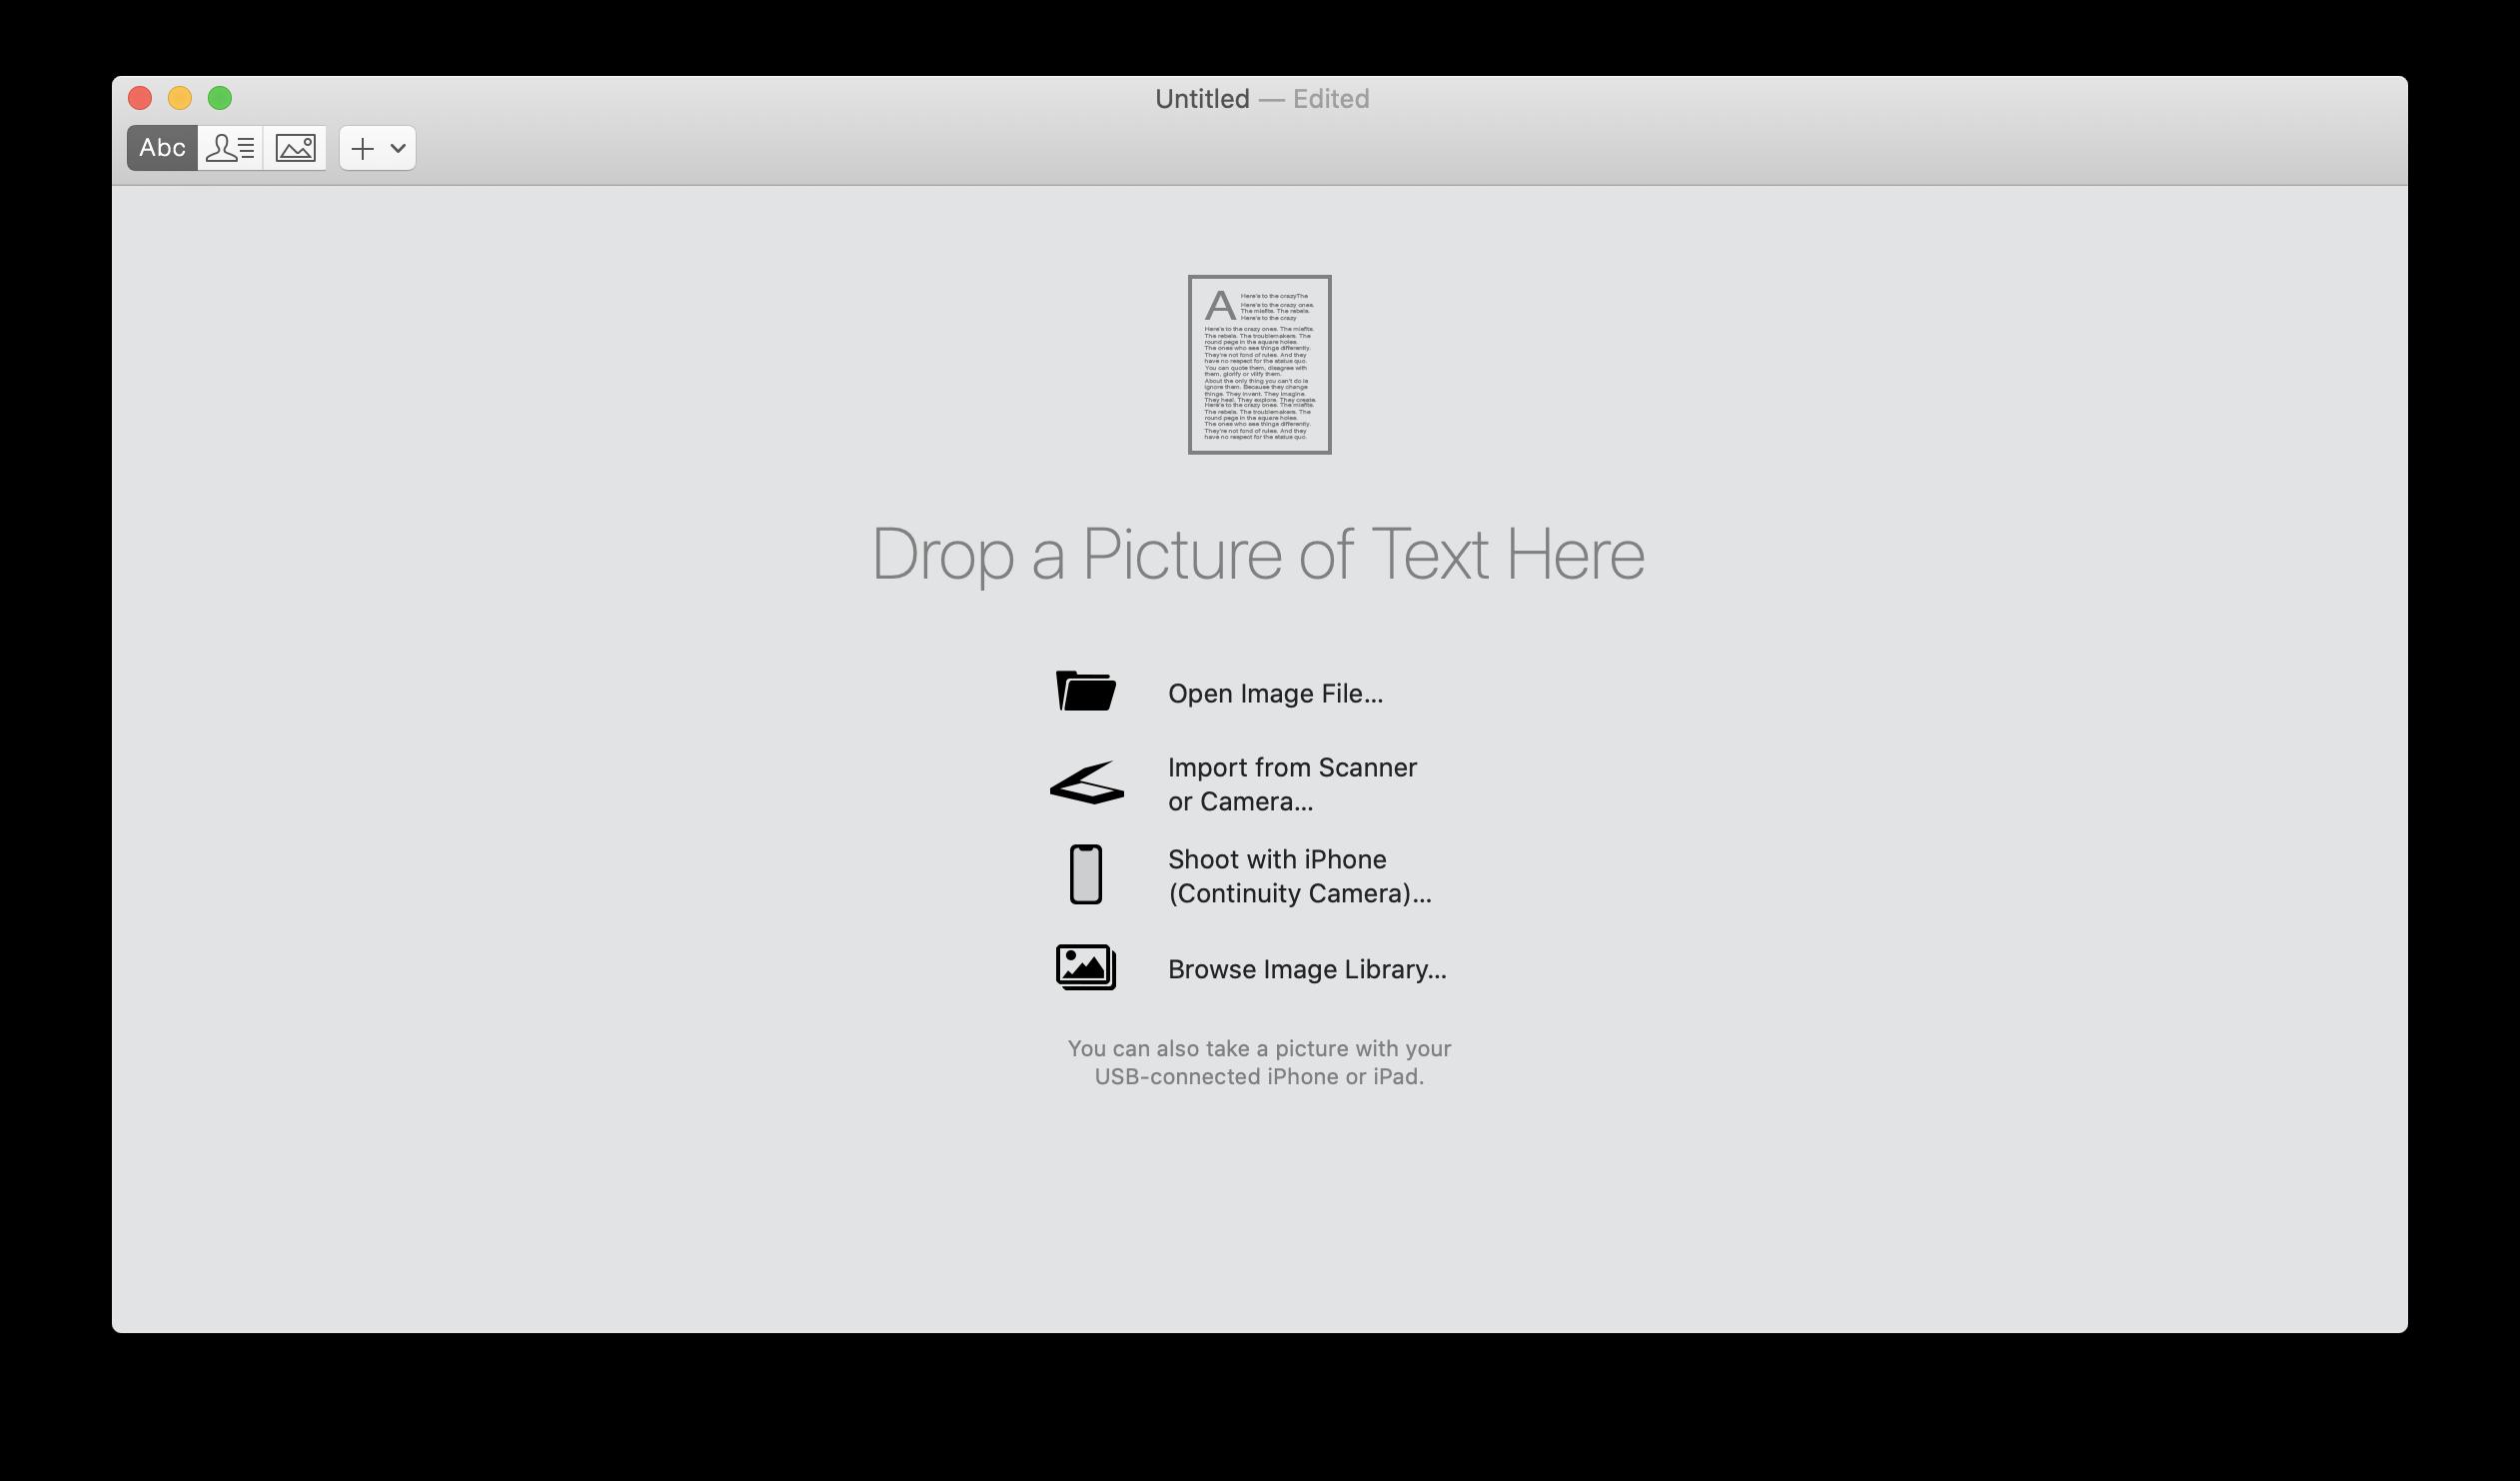 PDF-Bilddatei öffnen